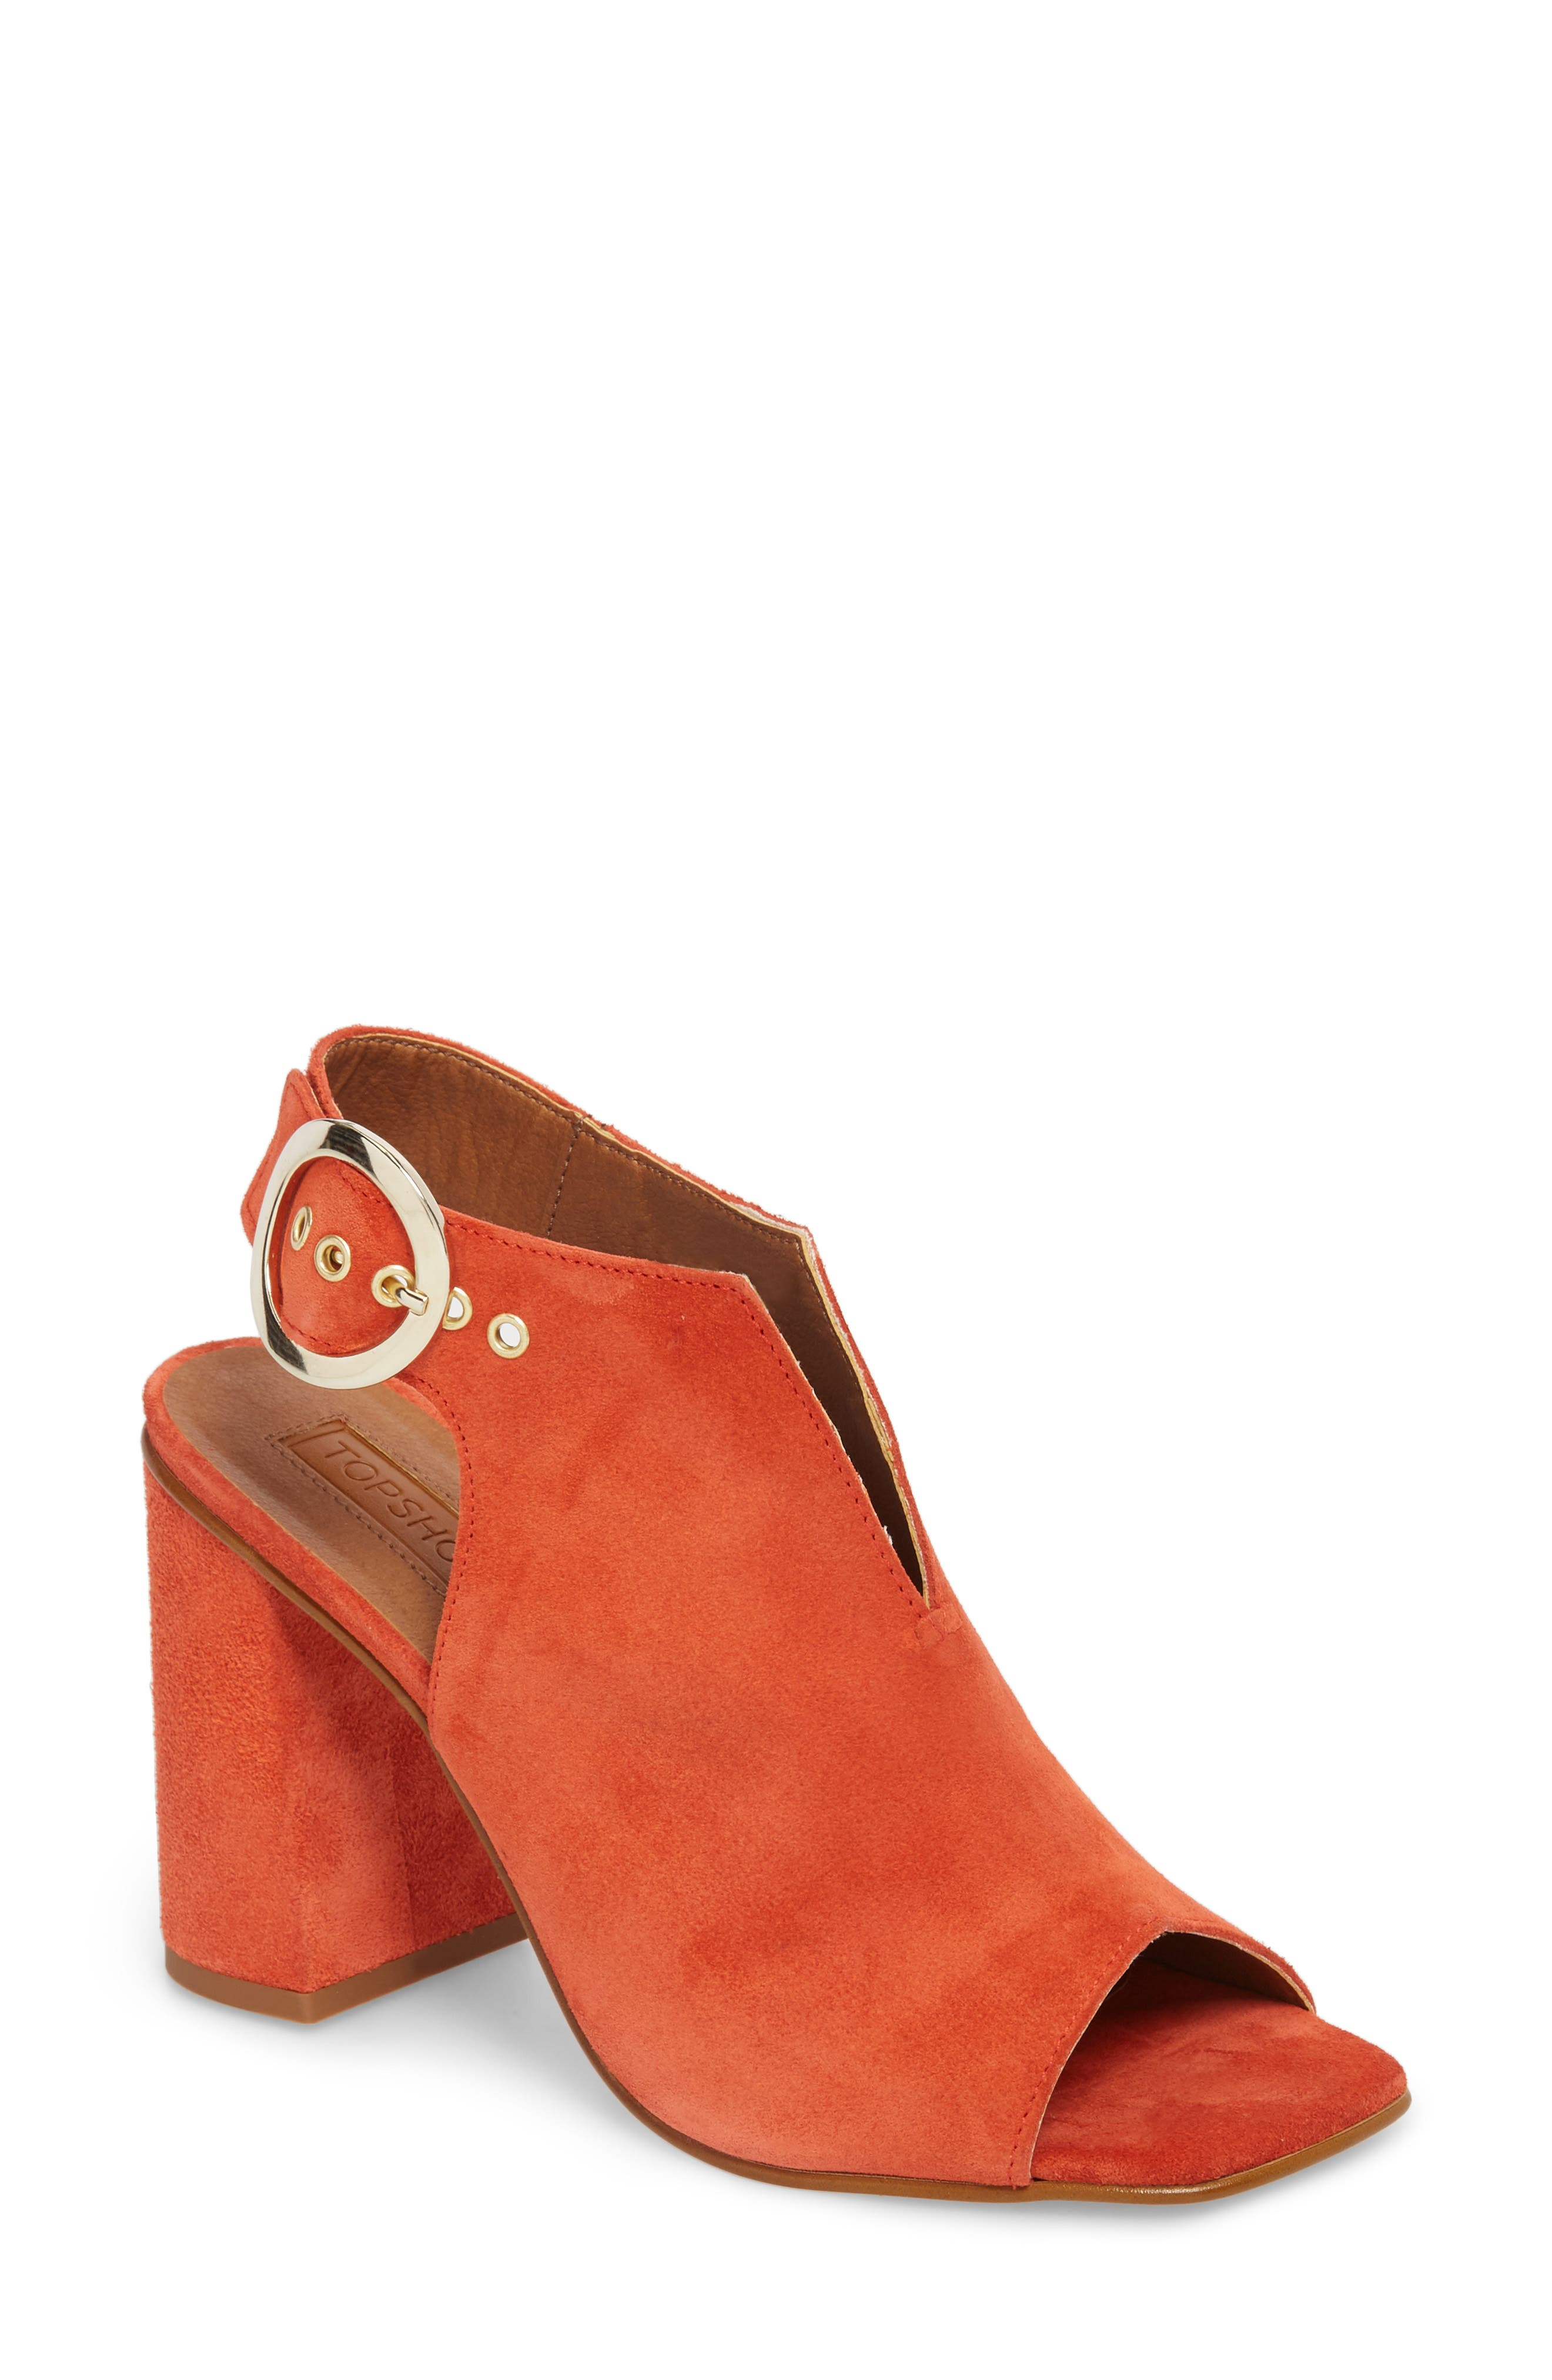 Nika Flared Heel Slingback Sandal,                             Main thumbnail 2, color,